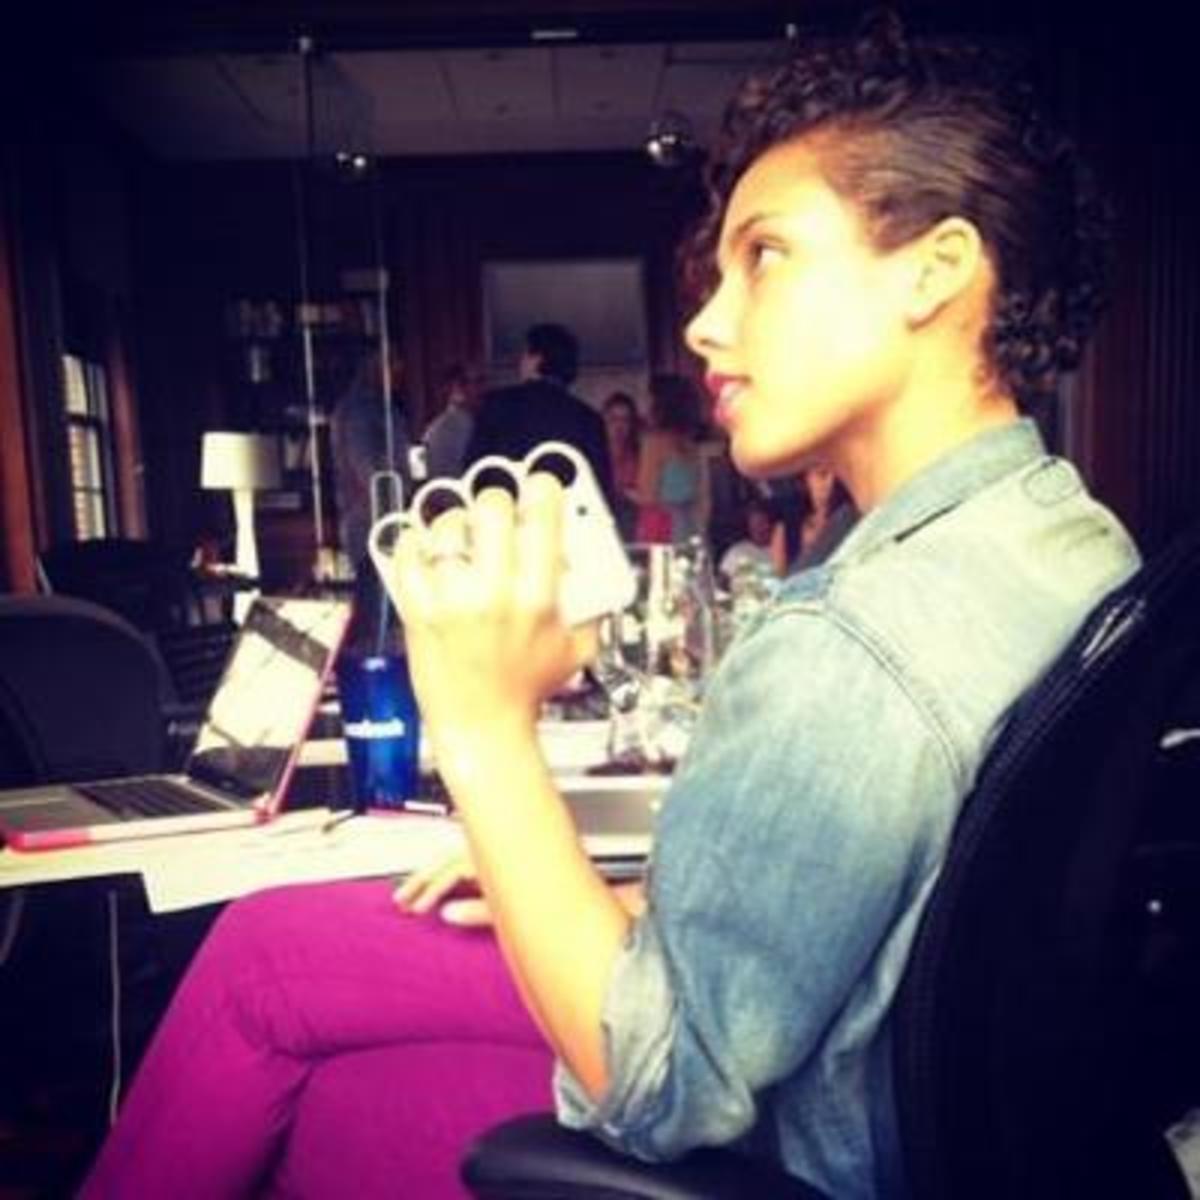 Alicia Keys with an iPhone knuckle case like Rihanna's